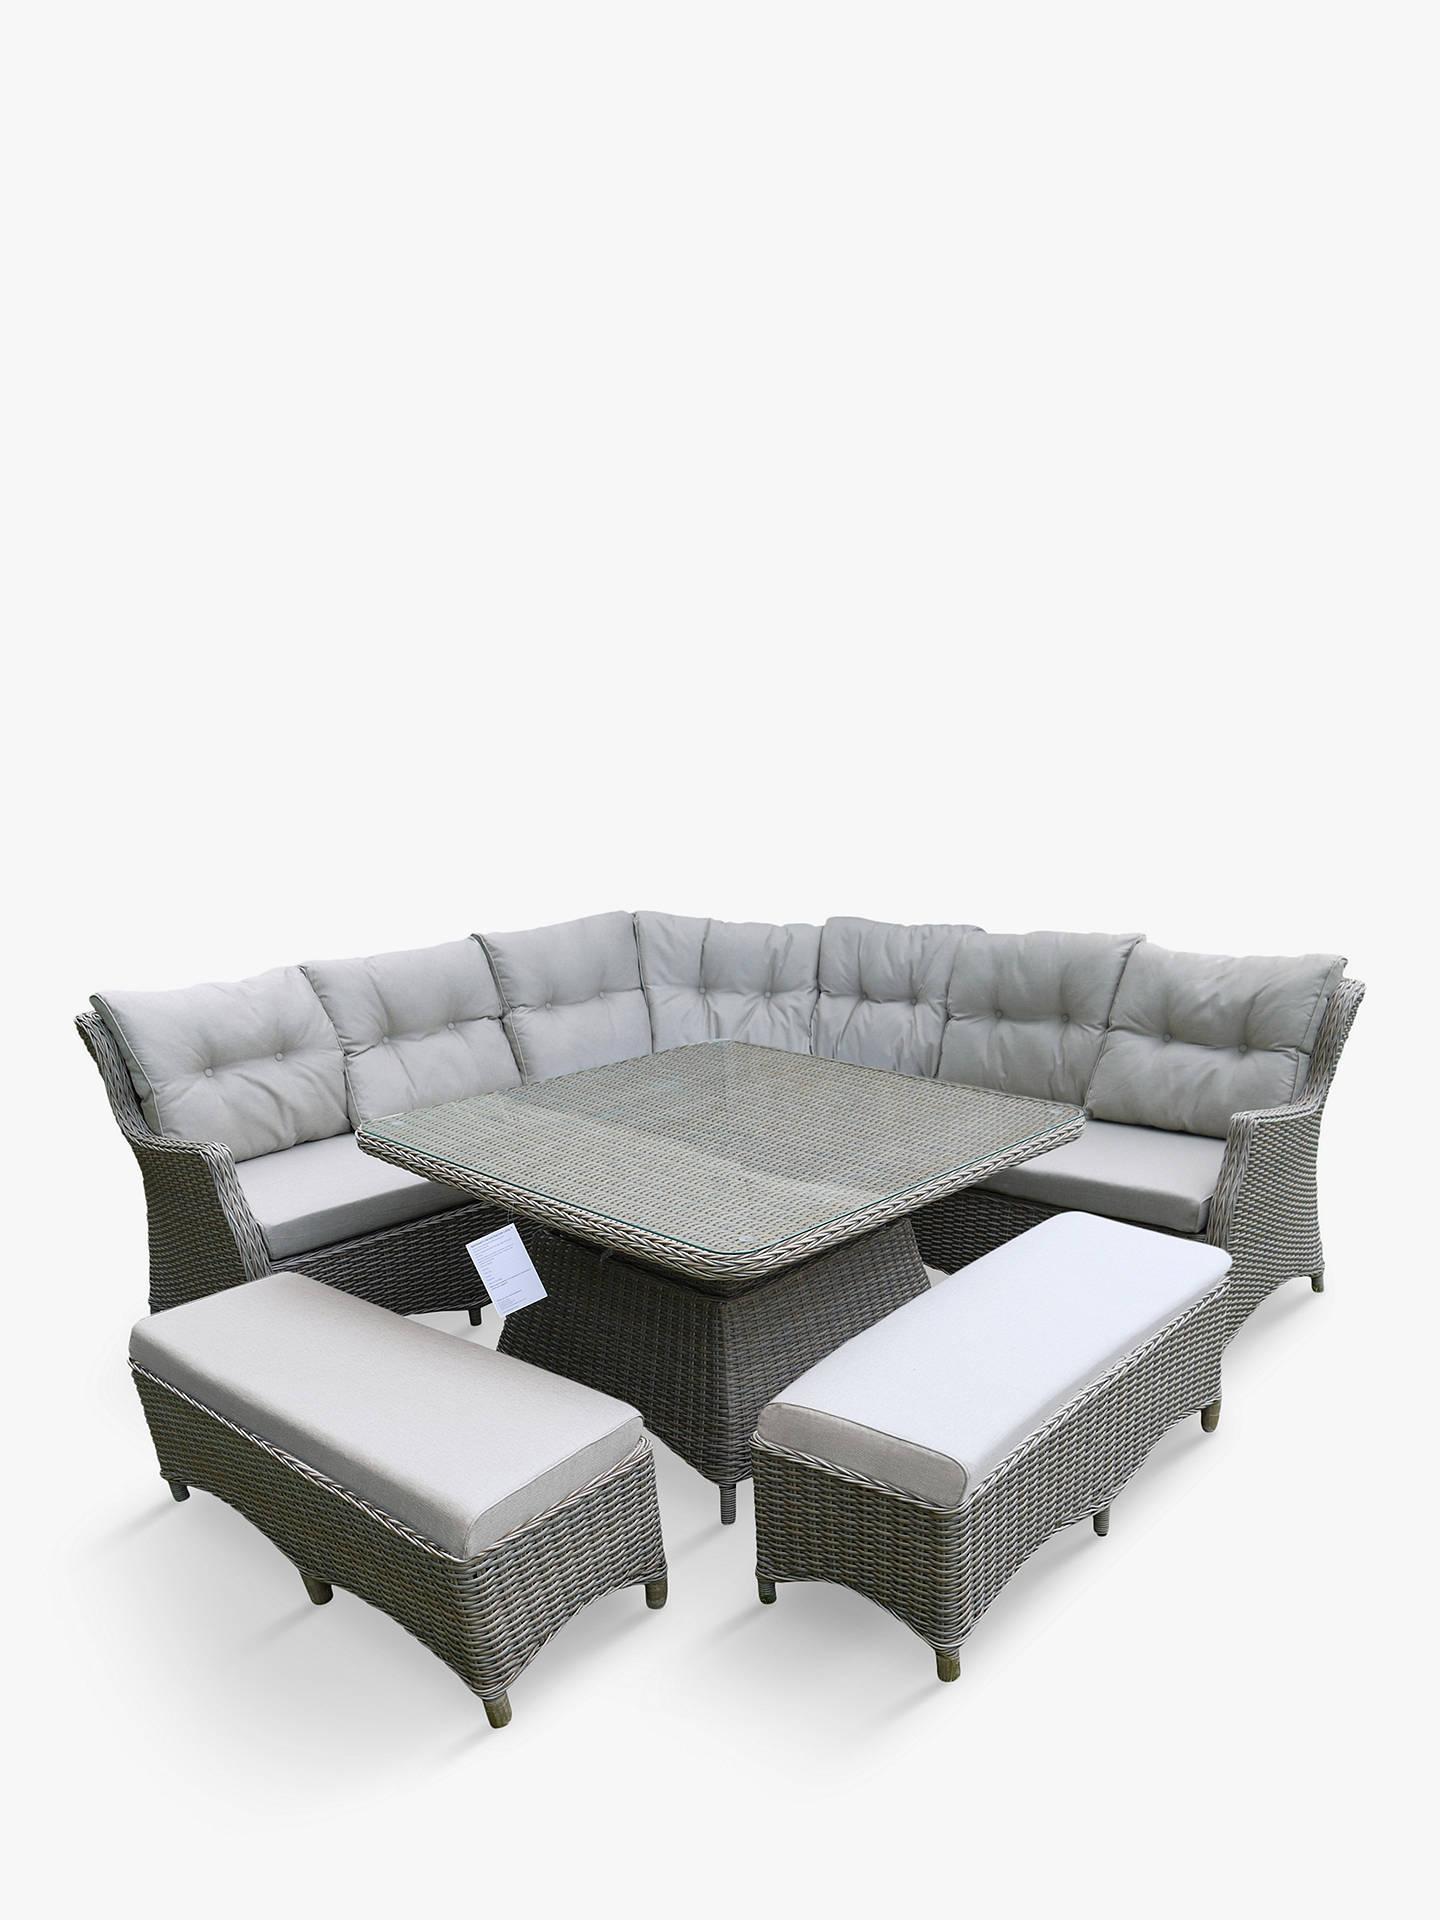 Lg Outdoor Toulon 10 Seat Modular Adjustable Garden Dining Table Lounging Chairs Set Brown At John Lewis Partners